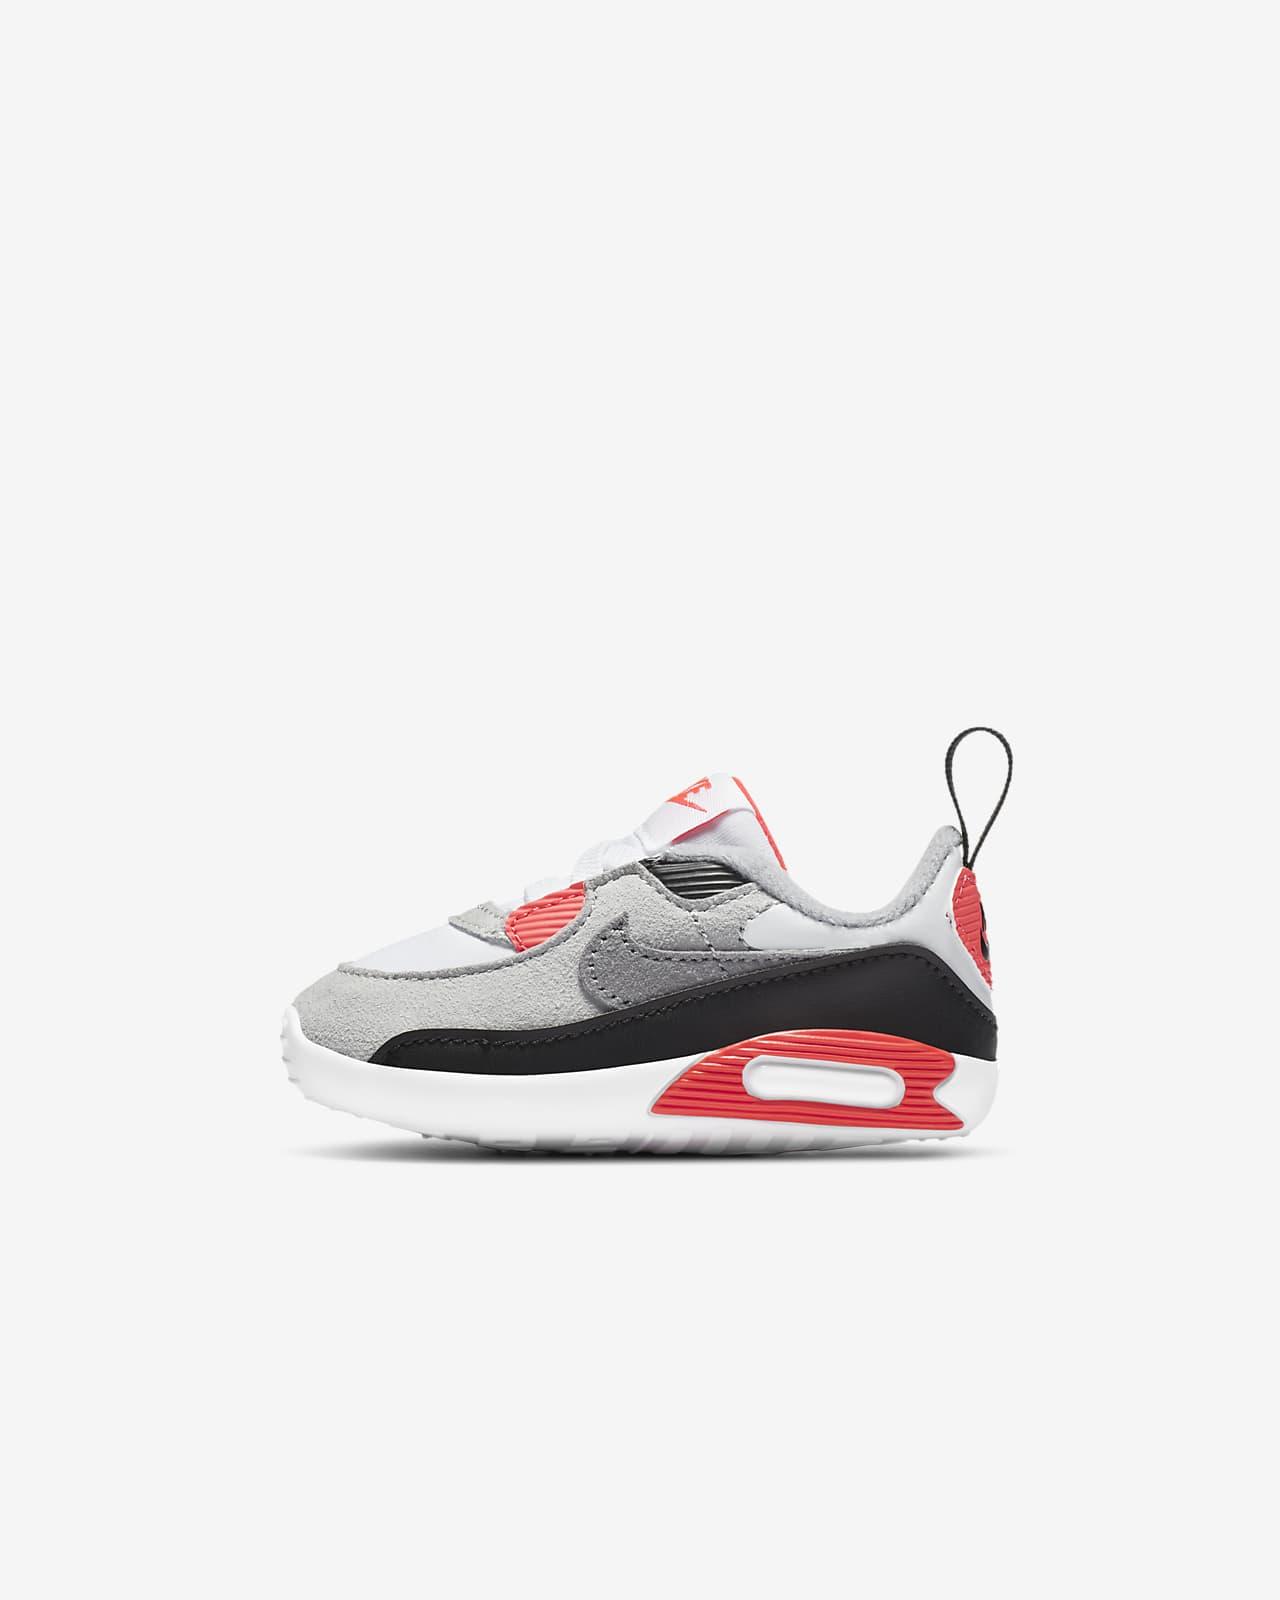 Nike Max 90 OG Baby Bootie